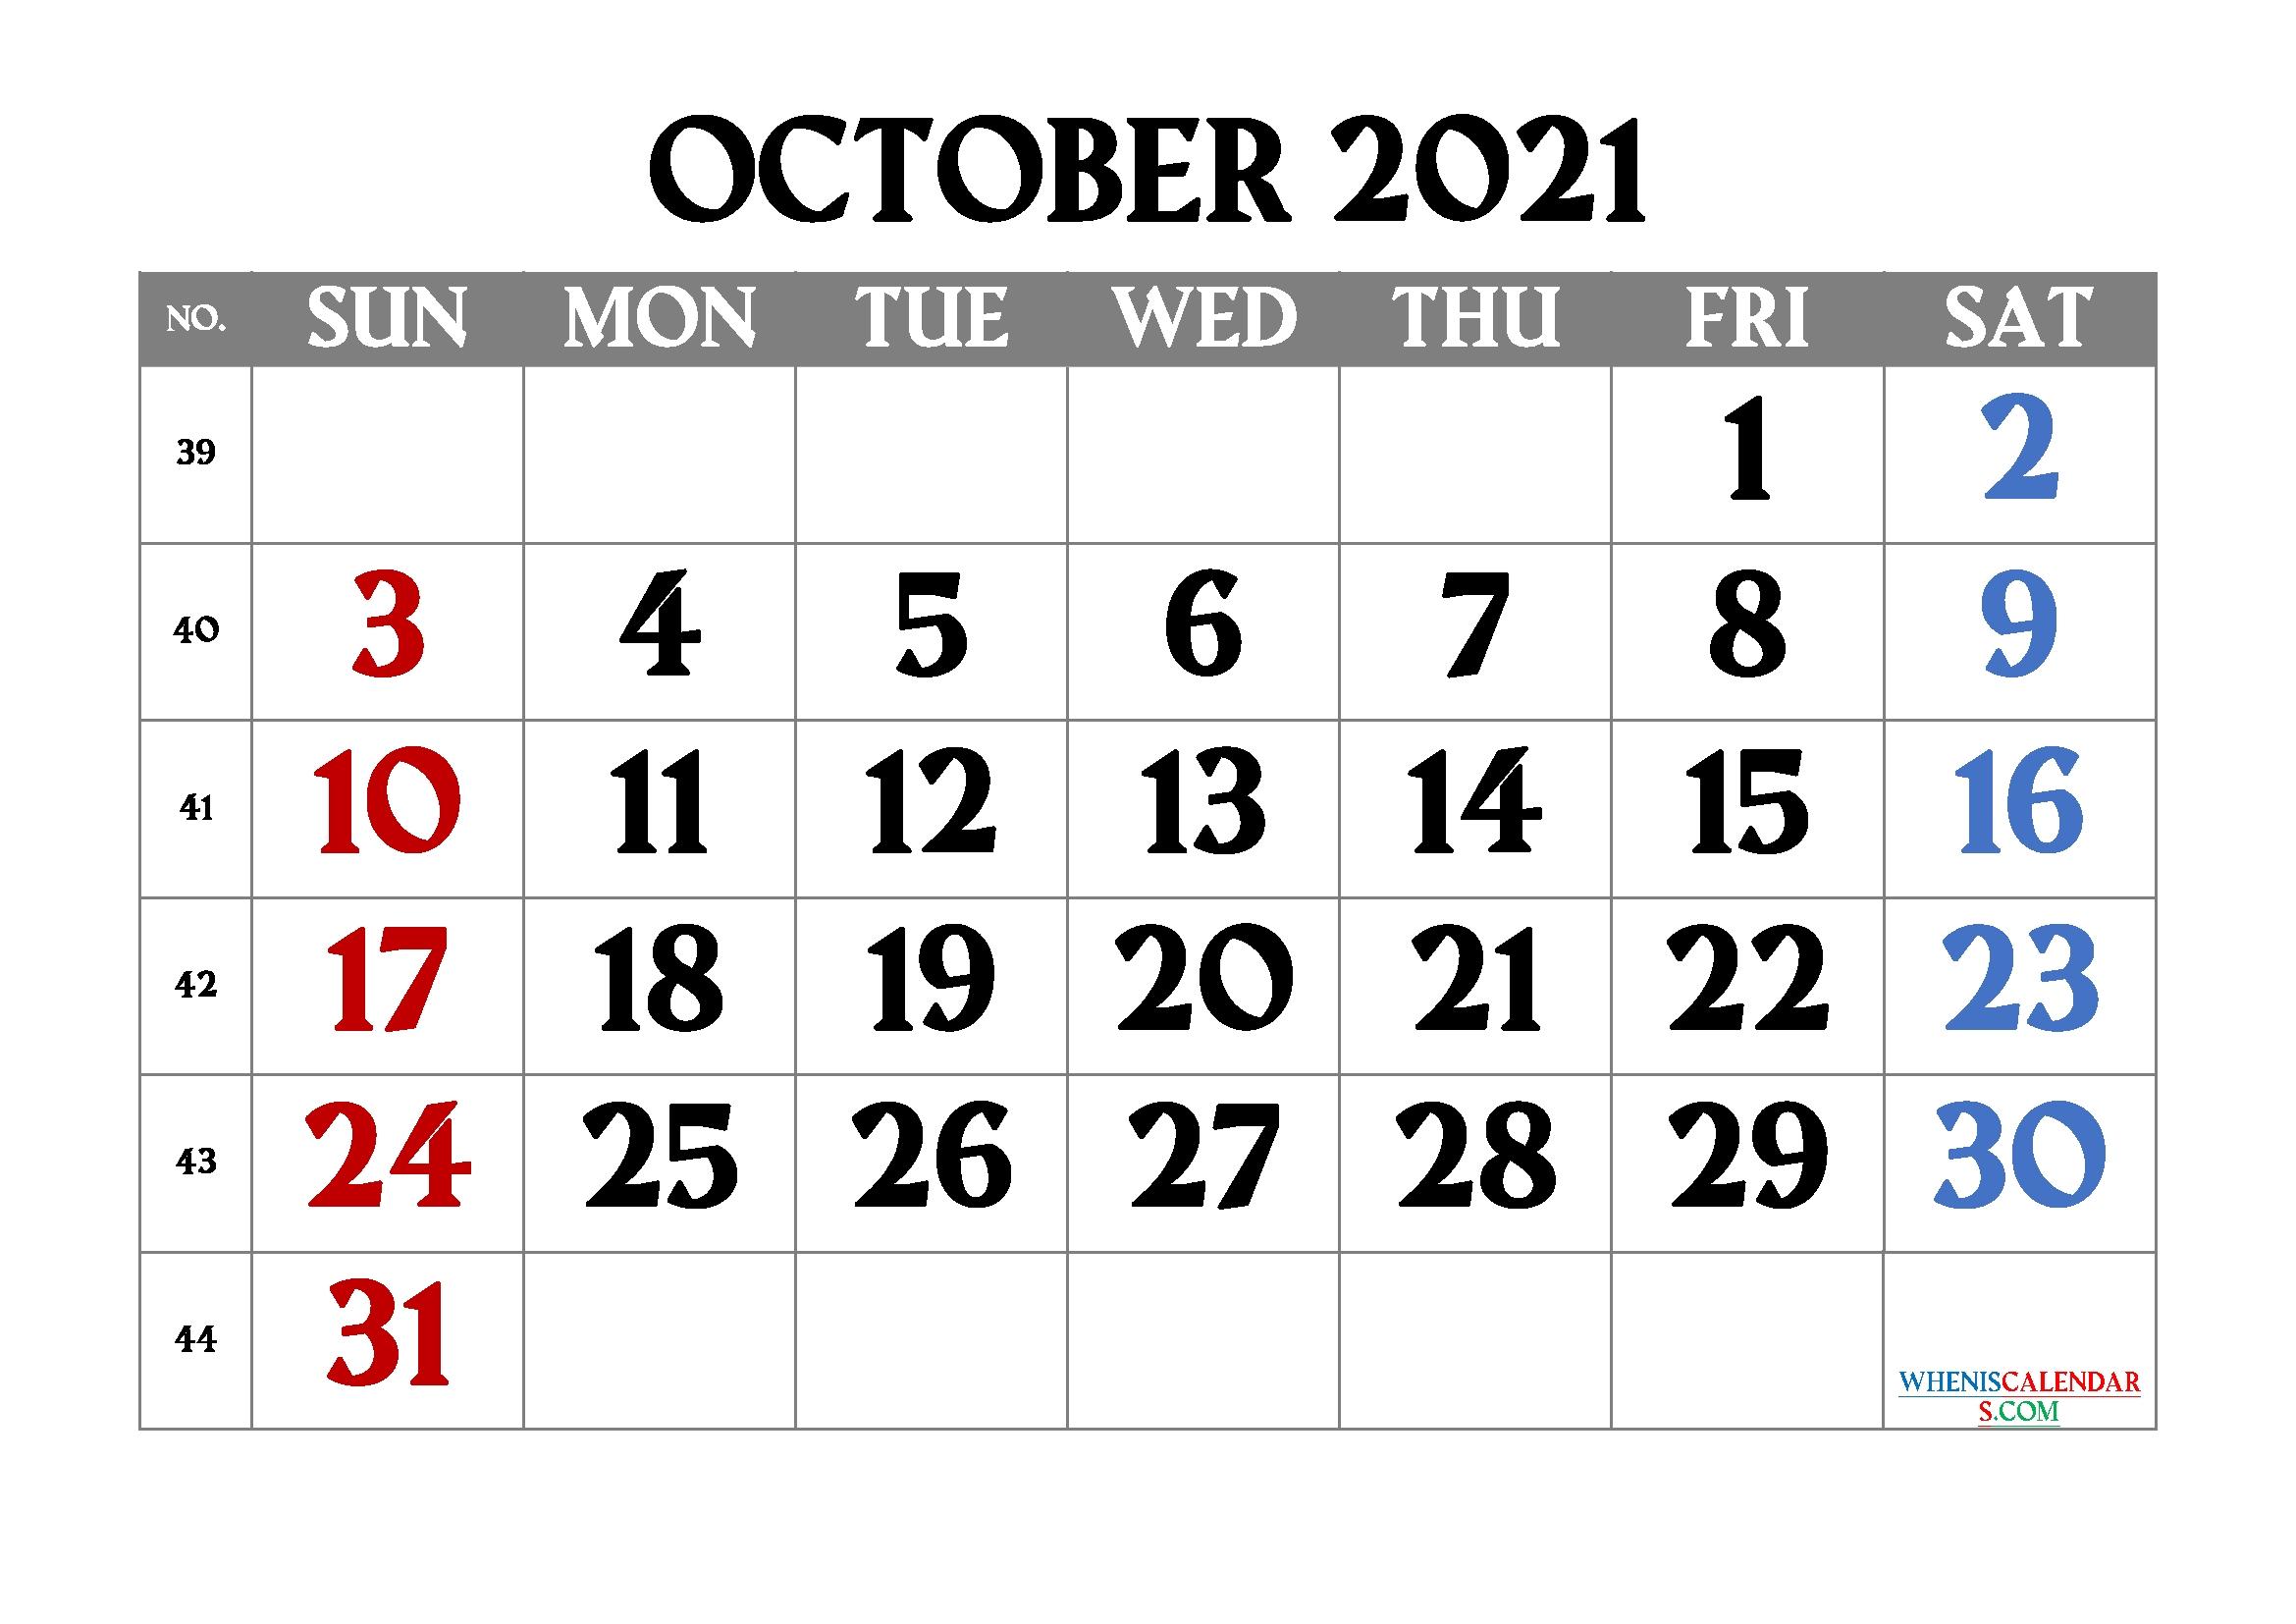 Free Printable October 2021 Calendar October 2021 Calendar To Print